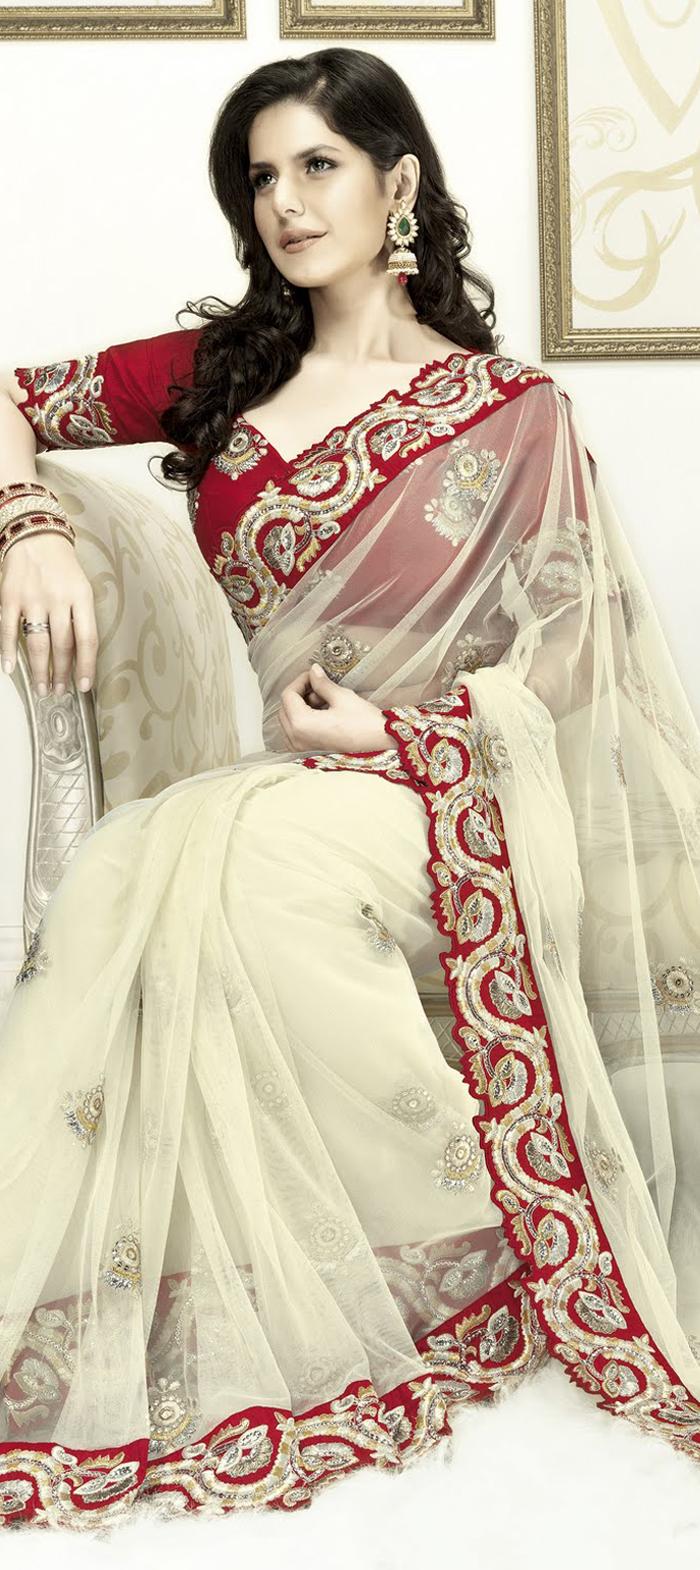 indian sari dresses sarees saree saris shadi wear bridal shoes desi sandals khan gowns latest india designs bride models female